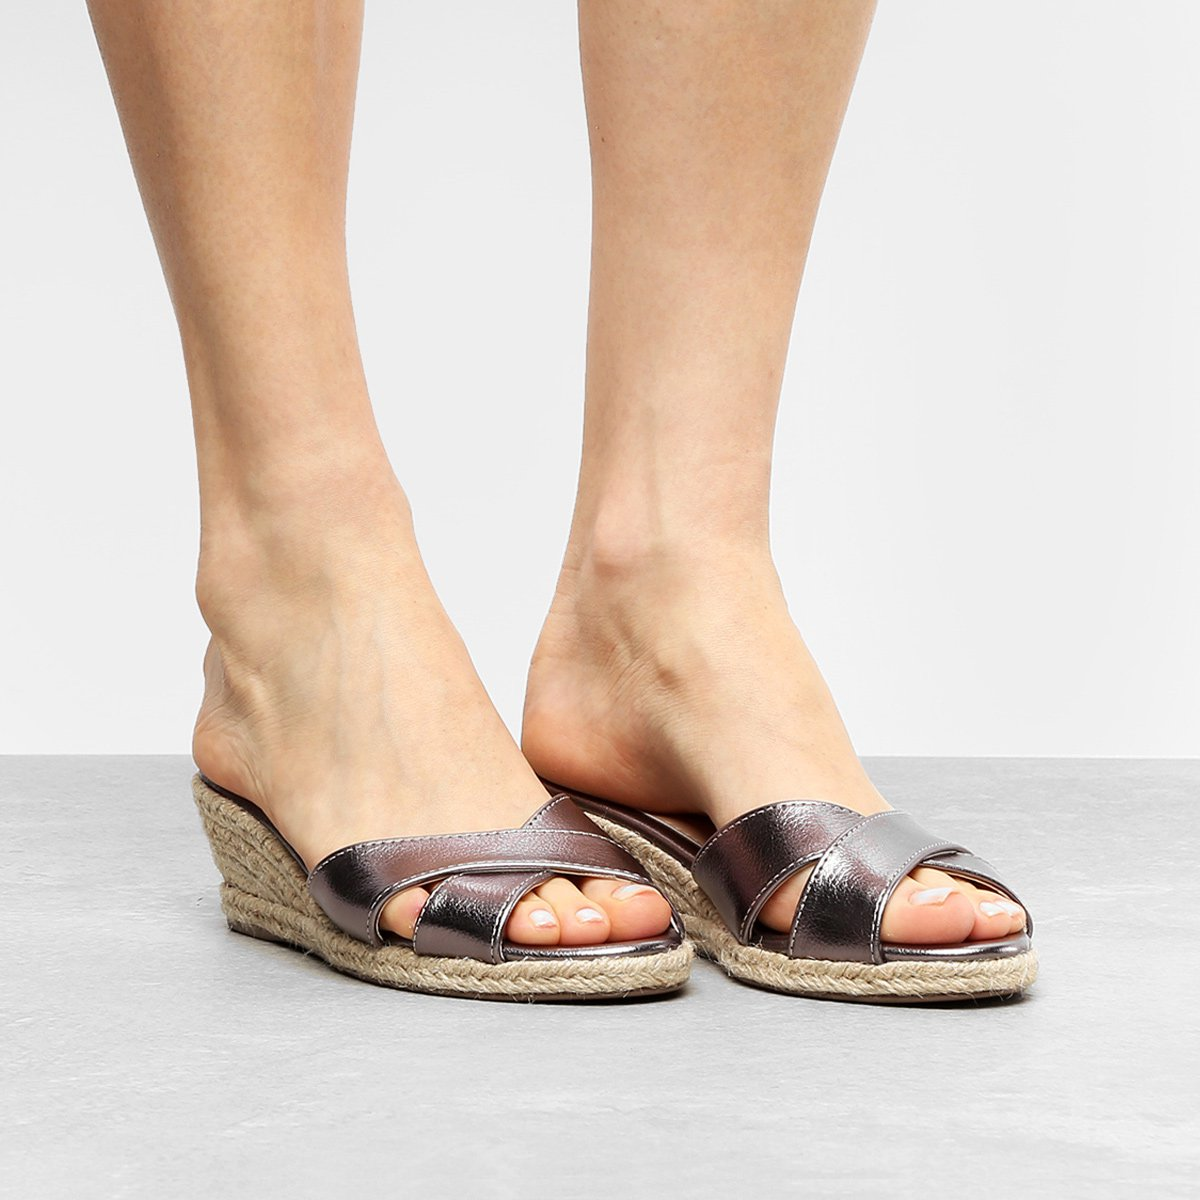 b1a1c62f3b Tamanco Anabela Shoestock Corda - Compre Agora